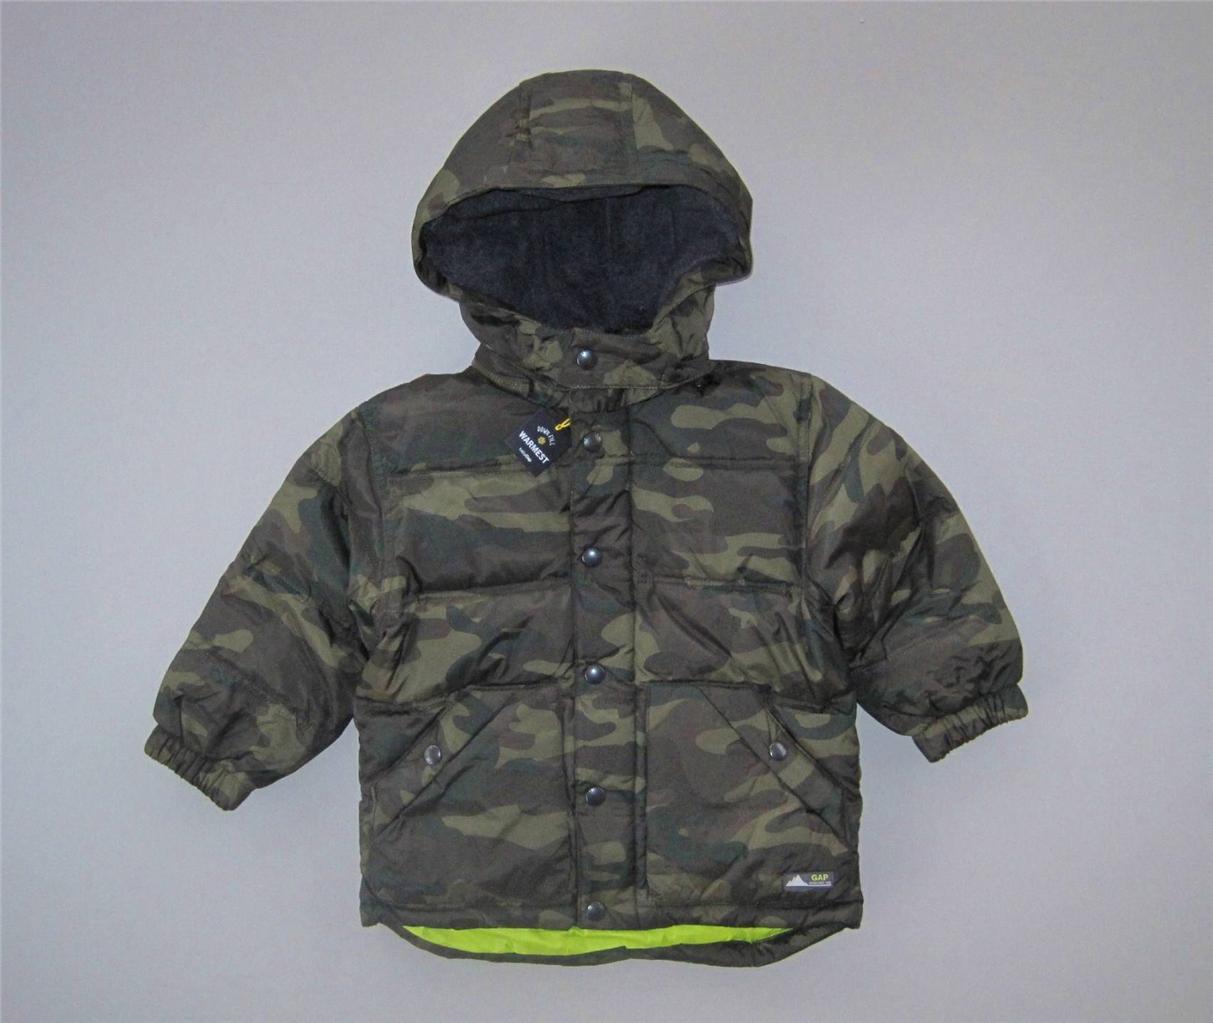 NWT Baby Gap Warmest Down Camo Puffer Jacket 2 3 4 5 2013